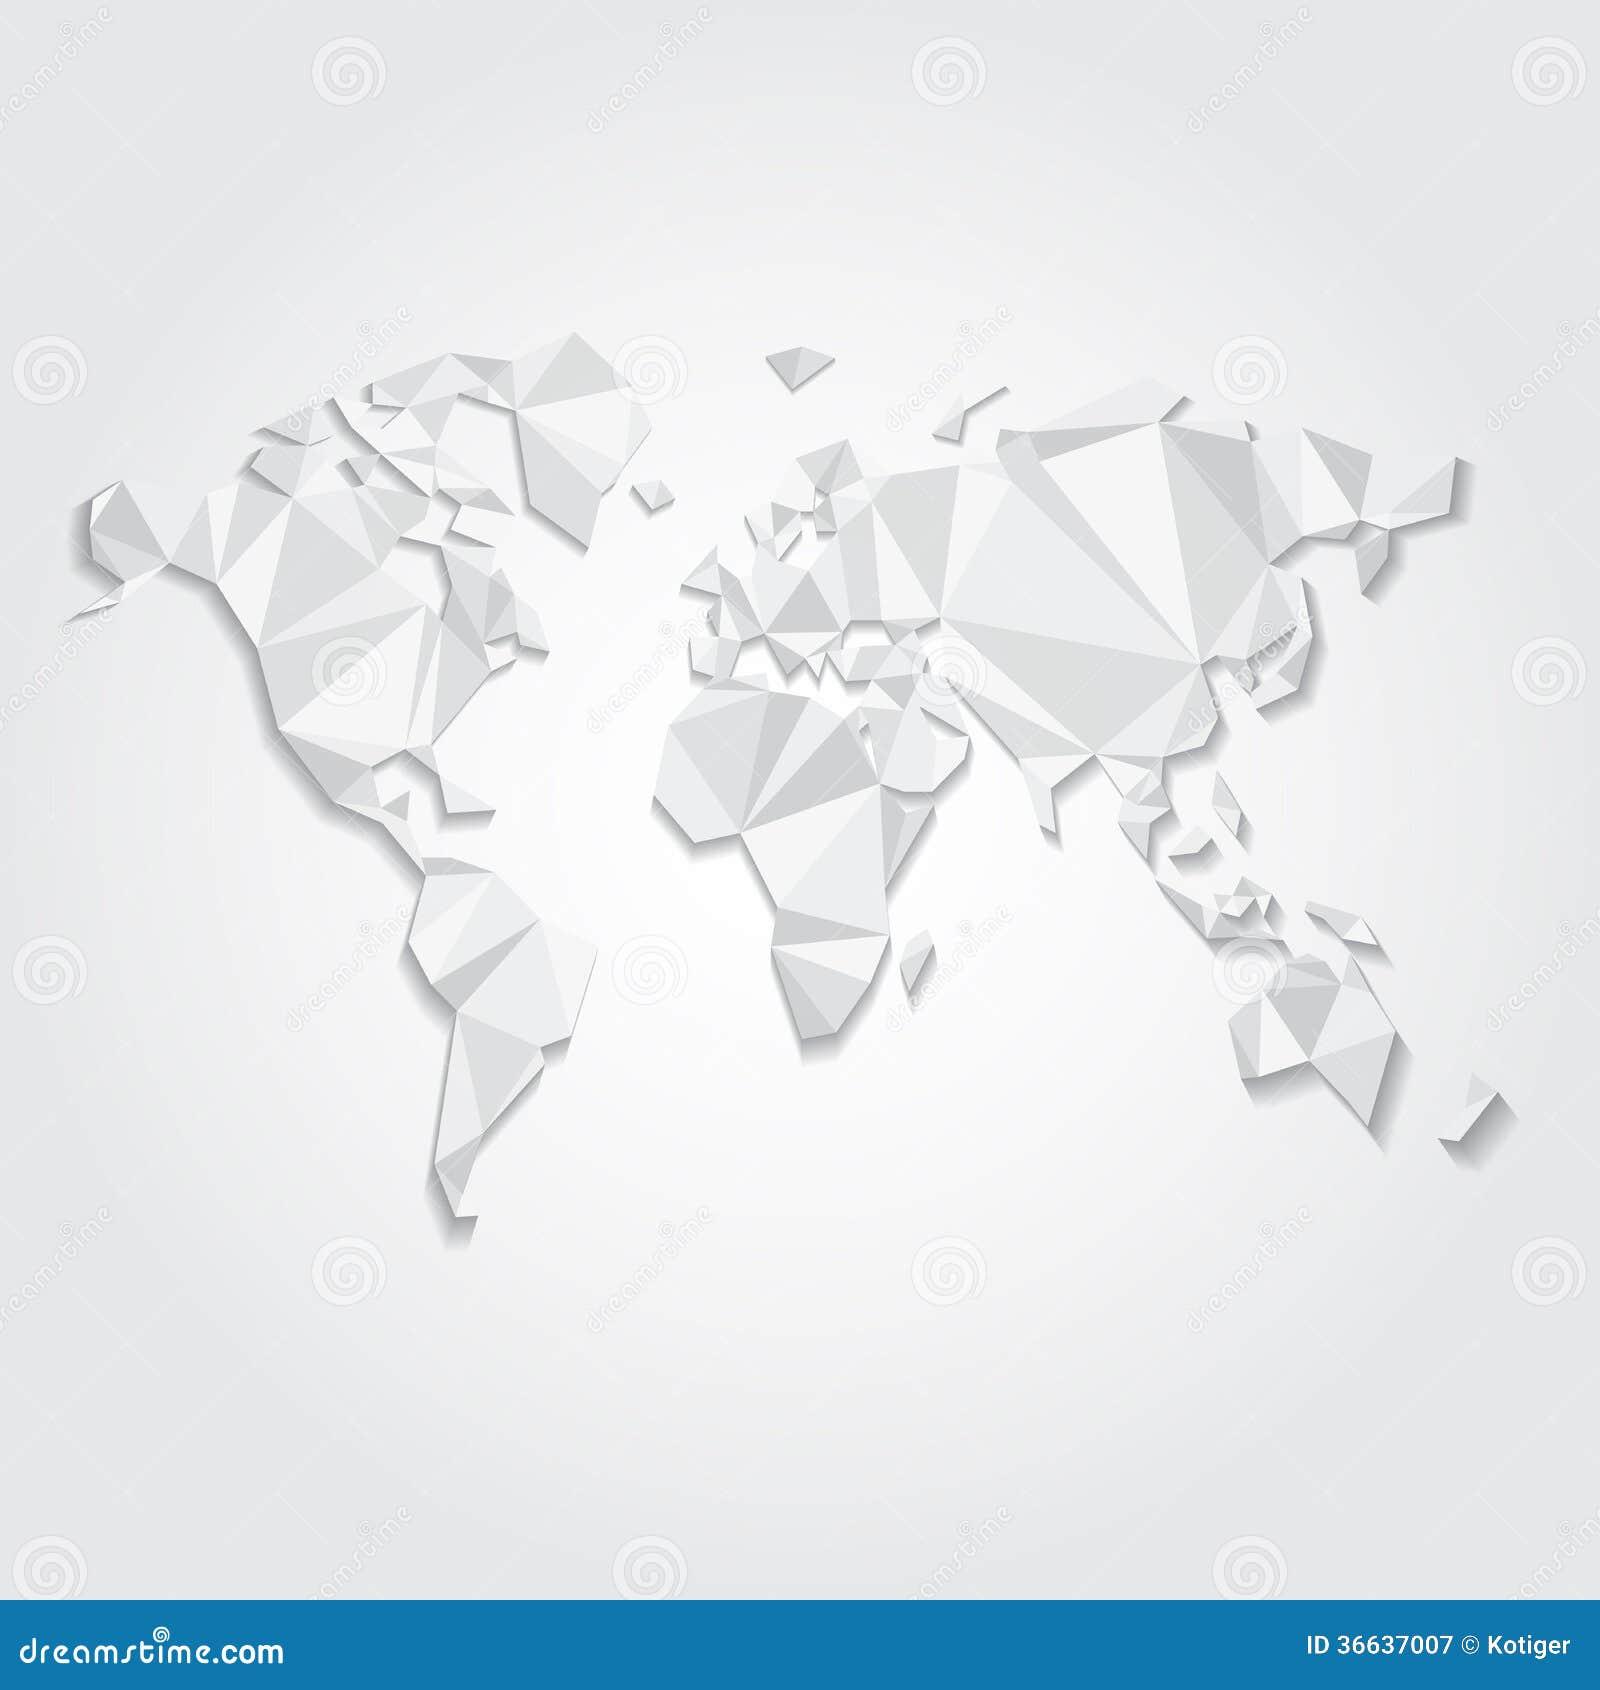 Triangular world map vector file stock vector illustration of triangular world map vector file gumiabroncs Gallery